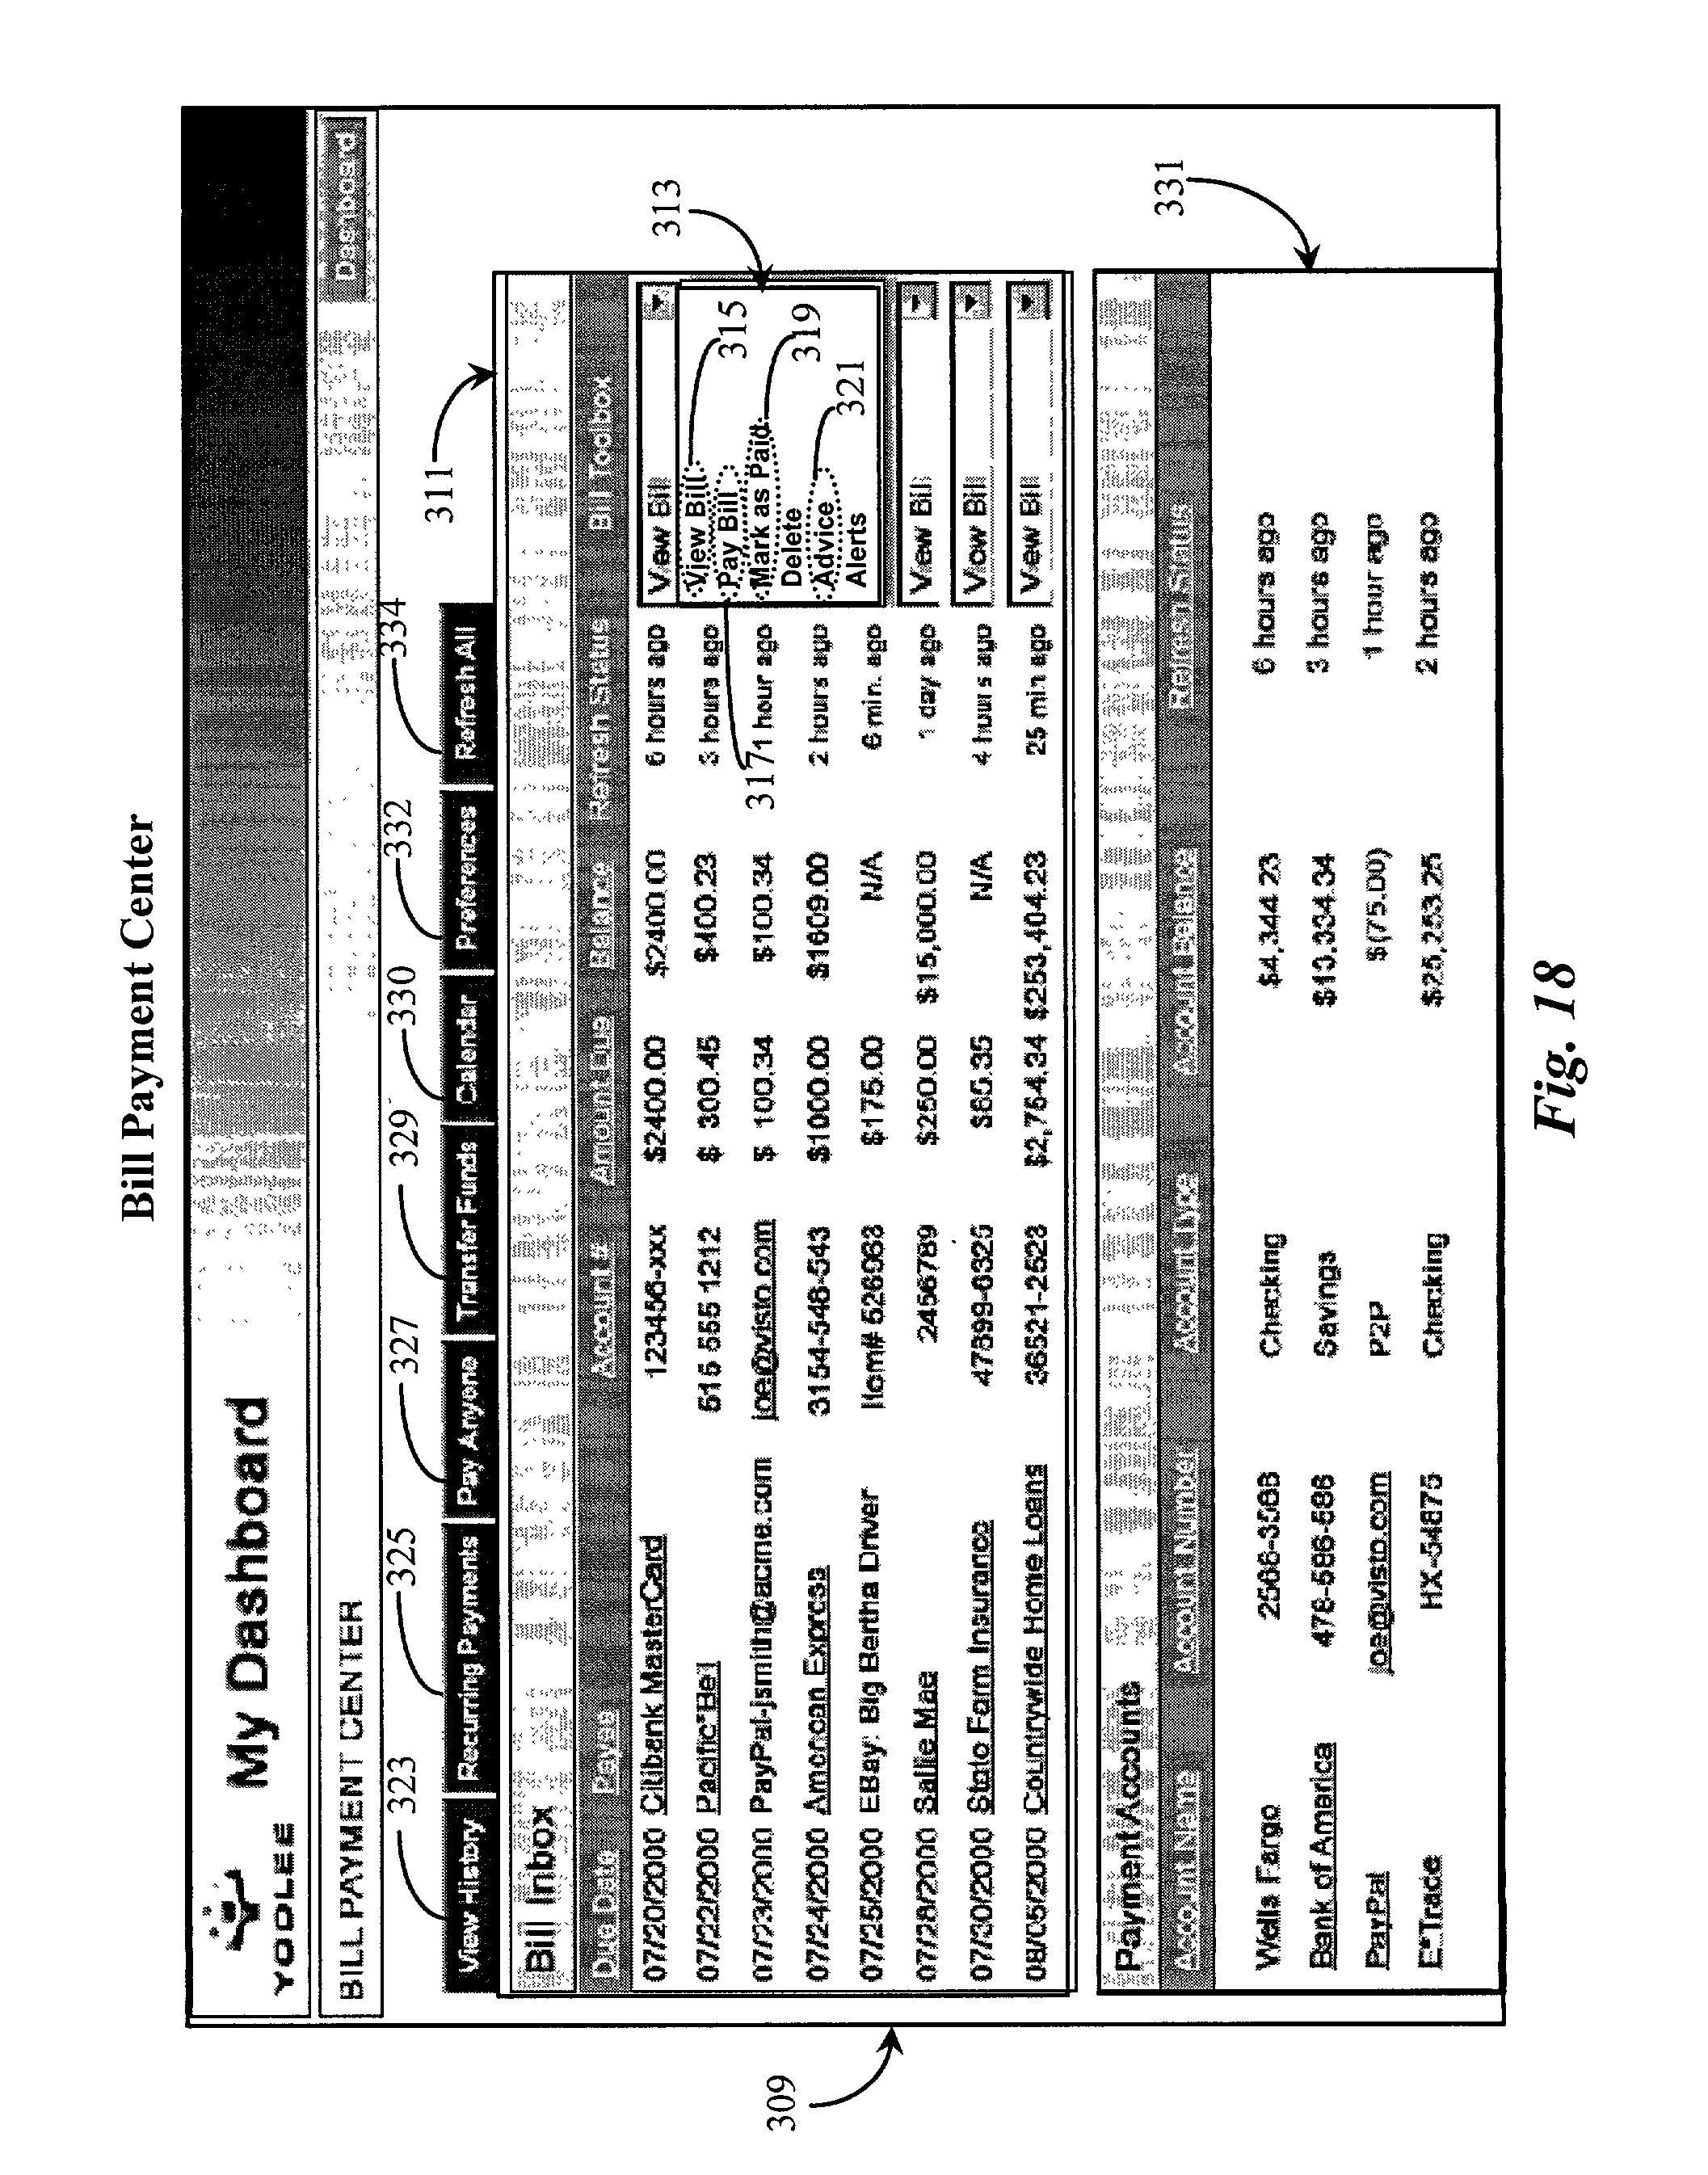 Patent US 20010023414A1